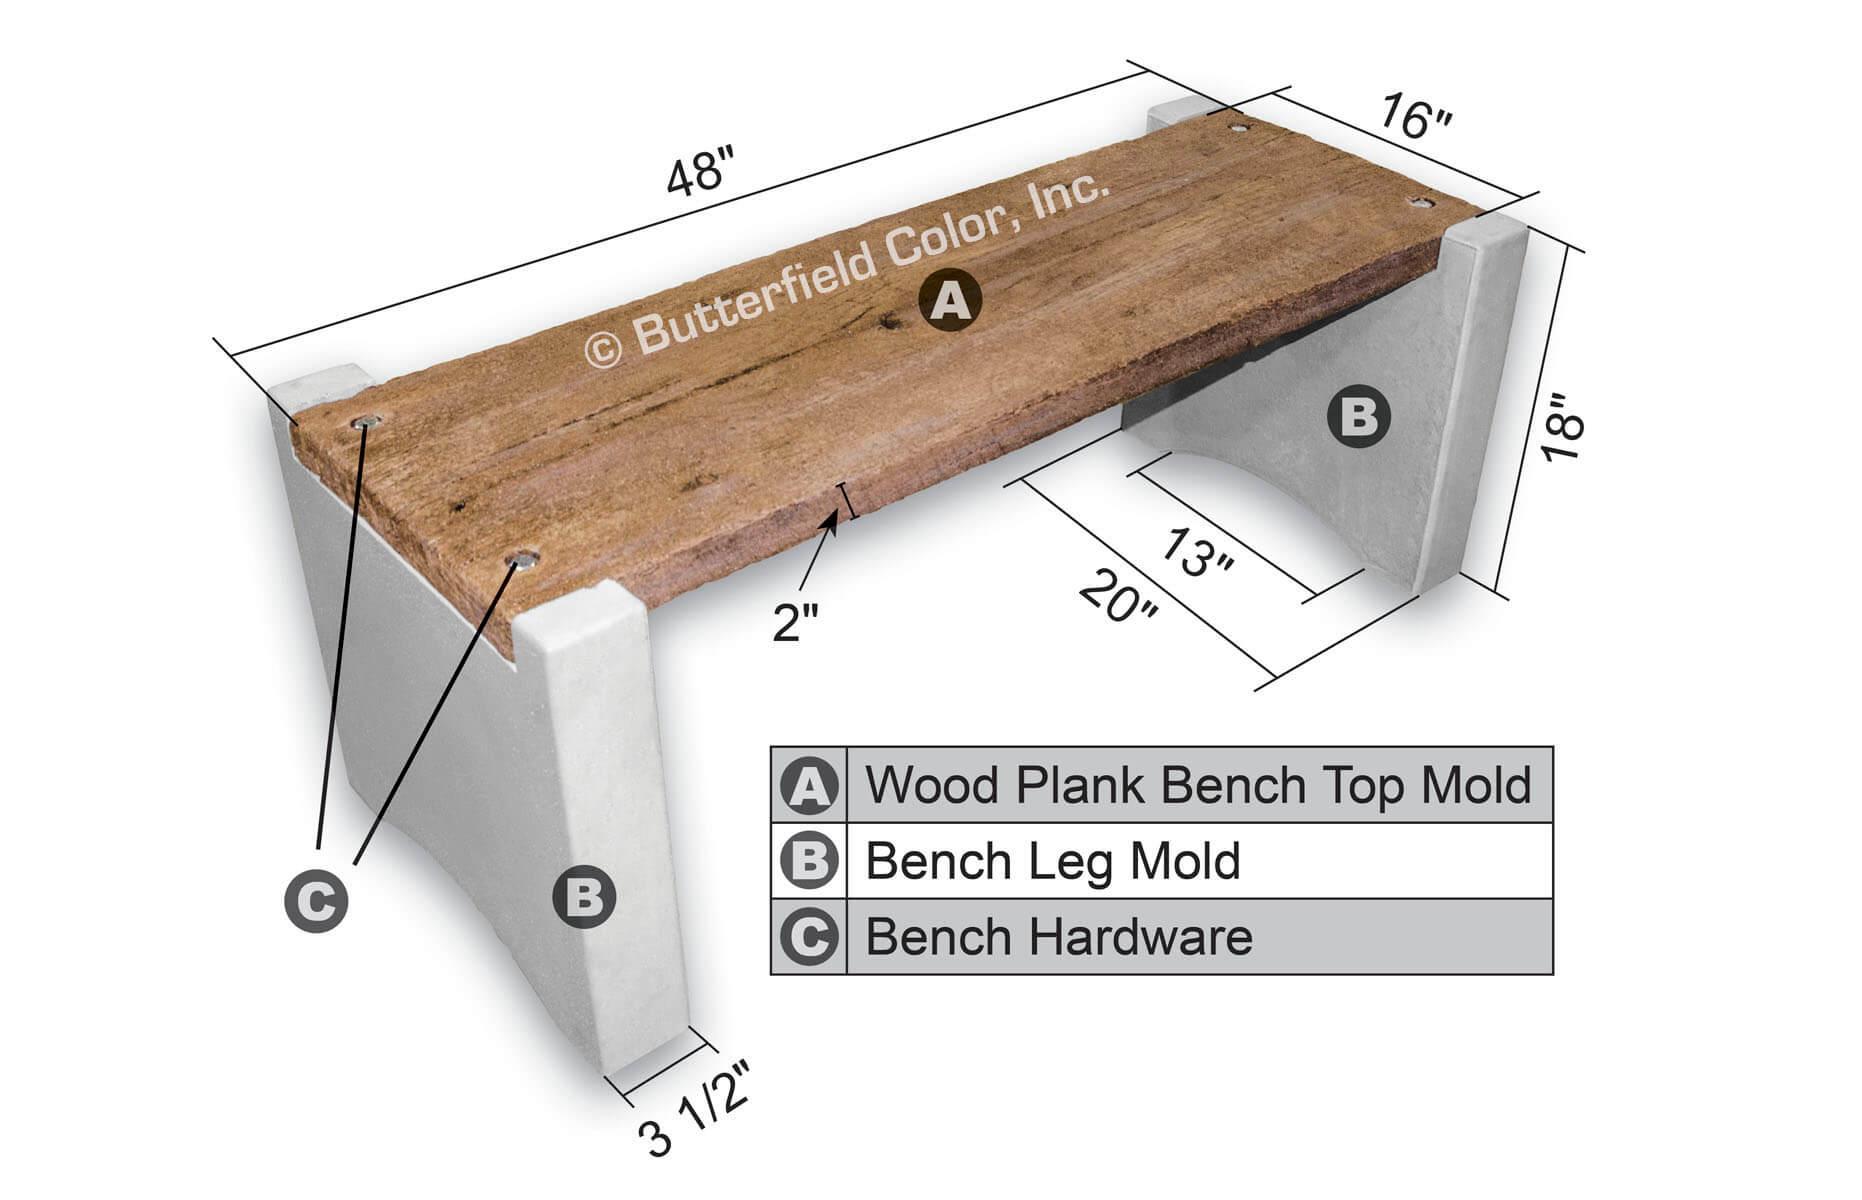 Sculpting, Molding & Ceramics Slip Casting Molds & Kits Concrete Bench Leg Molds